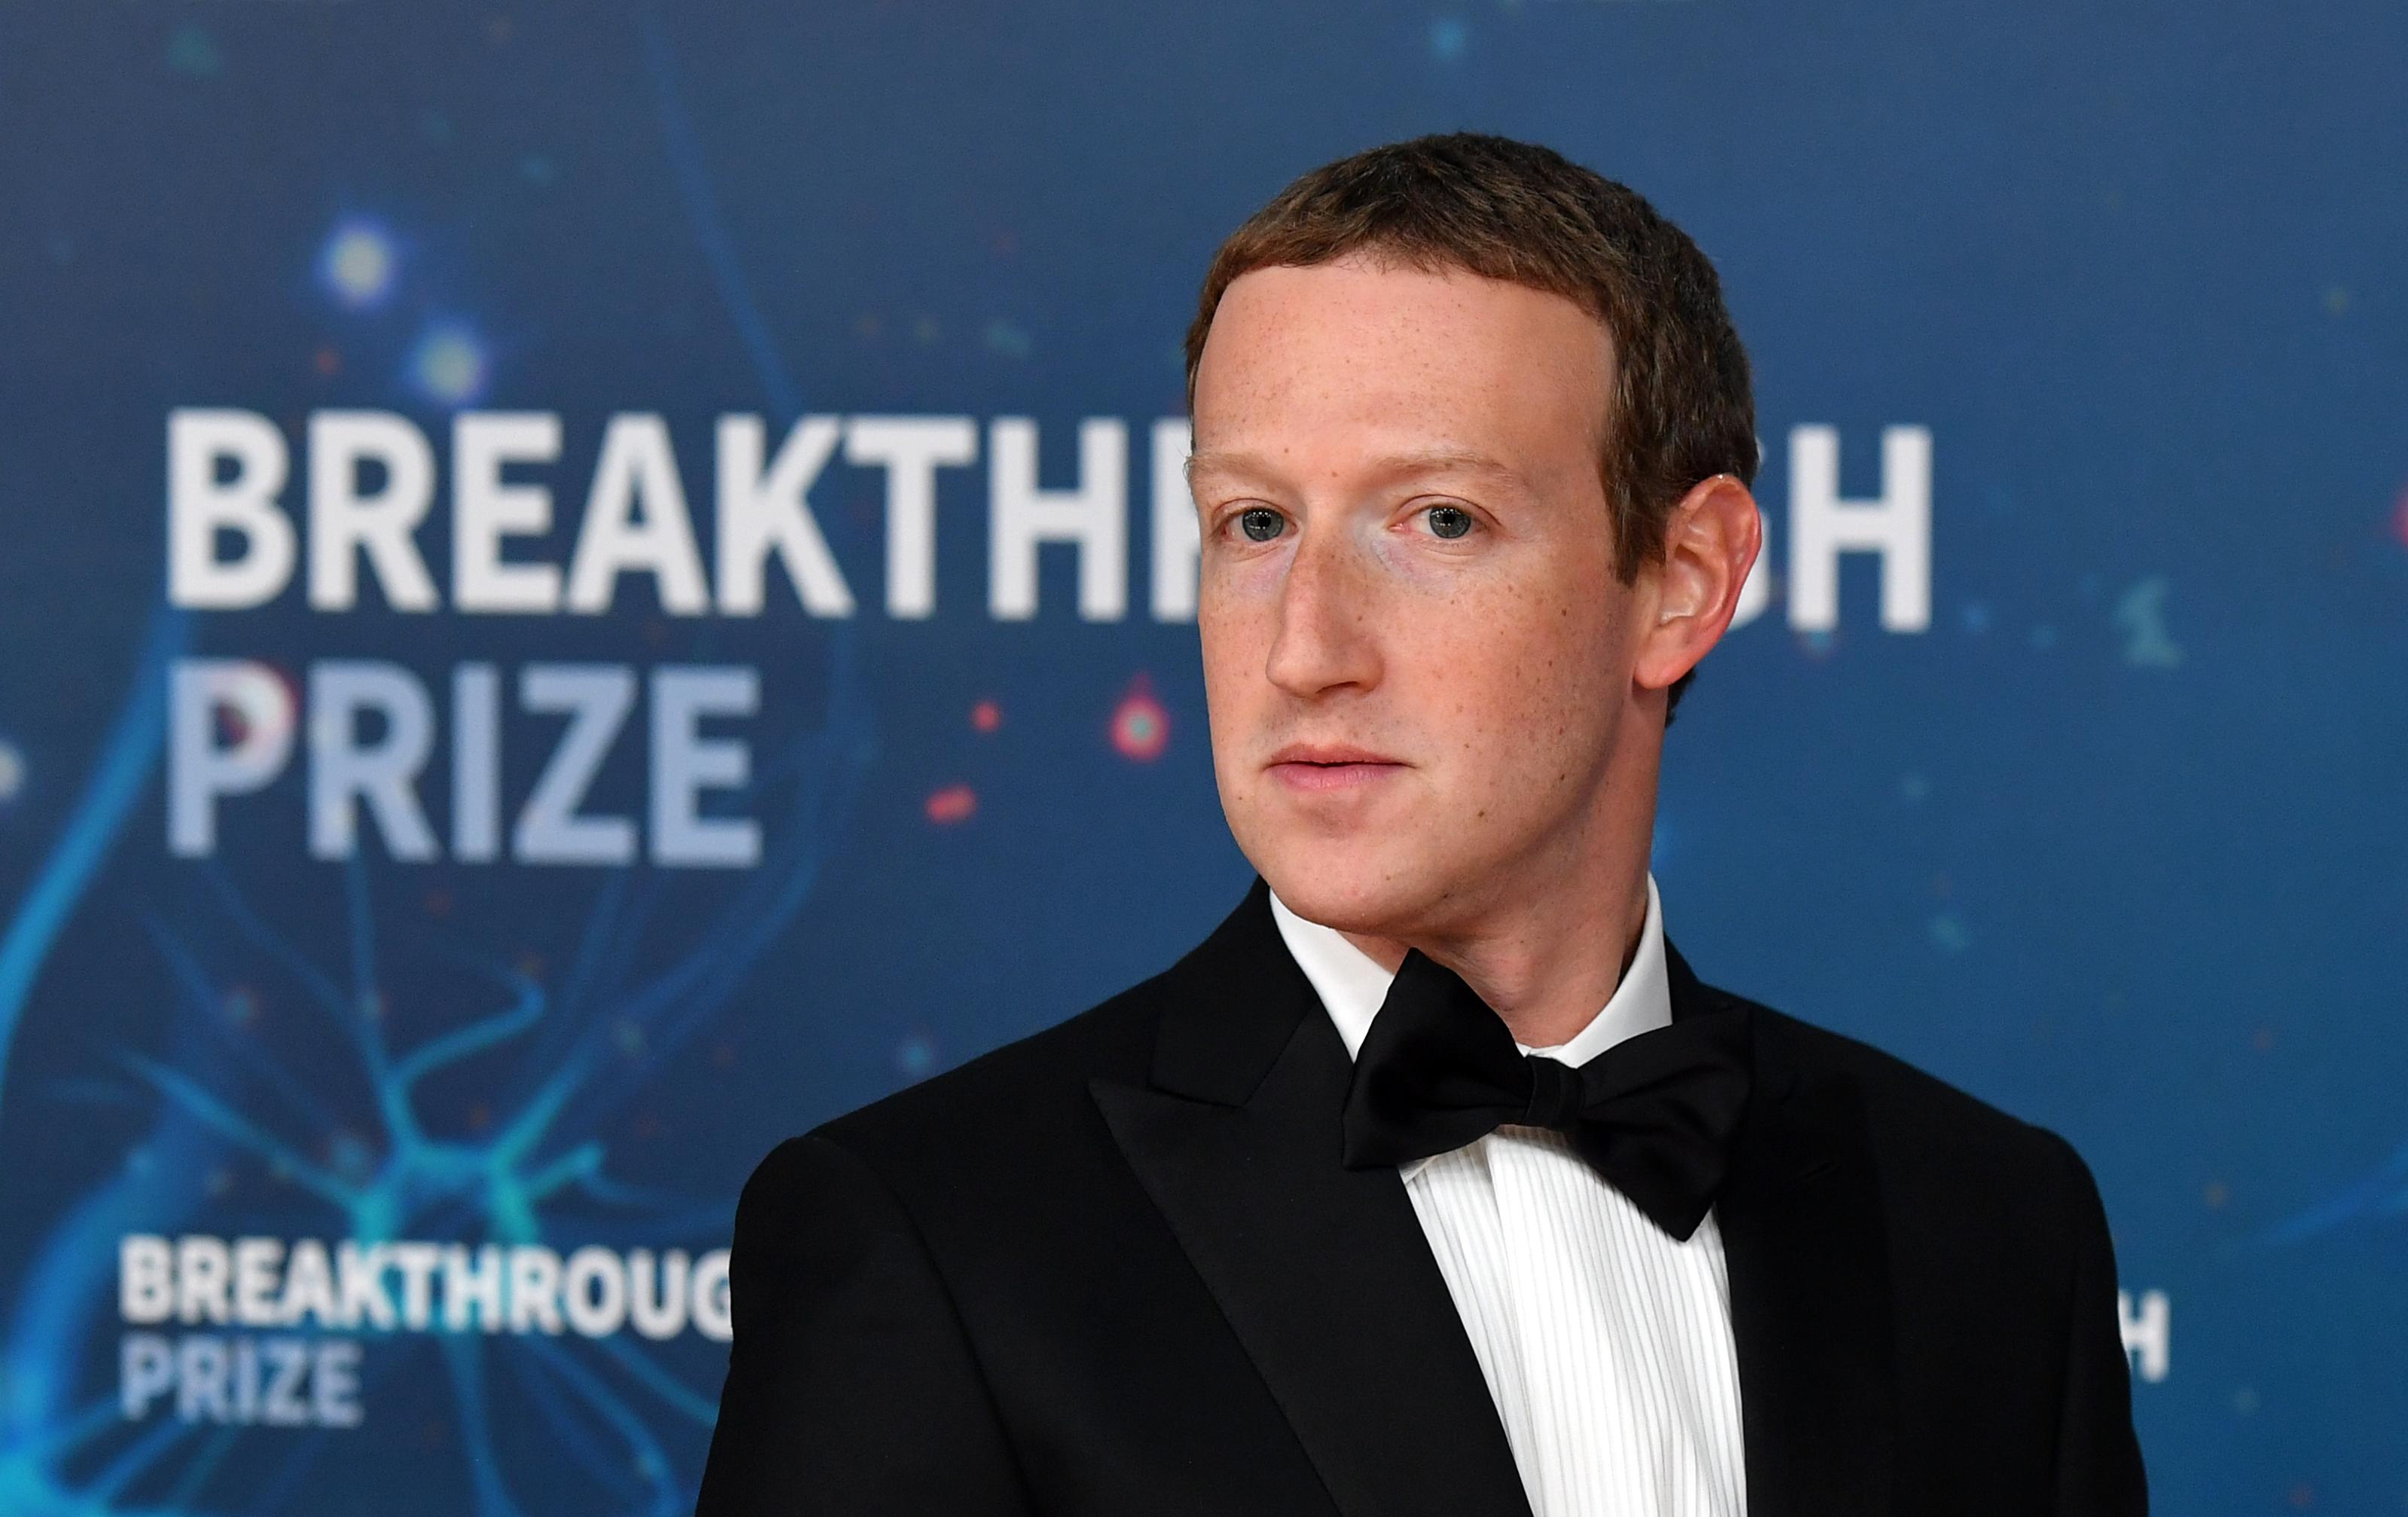 mark zuckerberg, warren buffett, rijkste mensen op aarde, vermogen, rijkste personen ter wereld